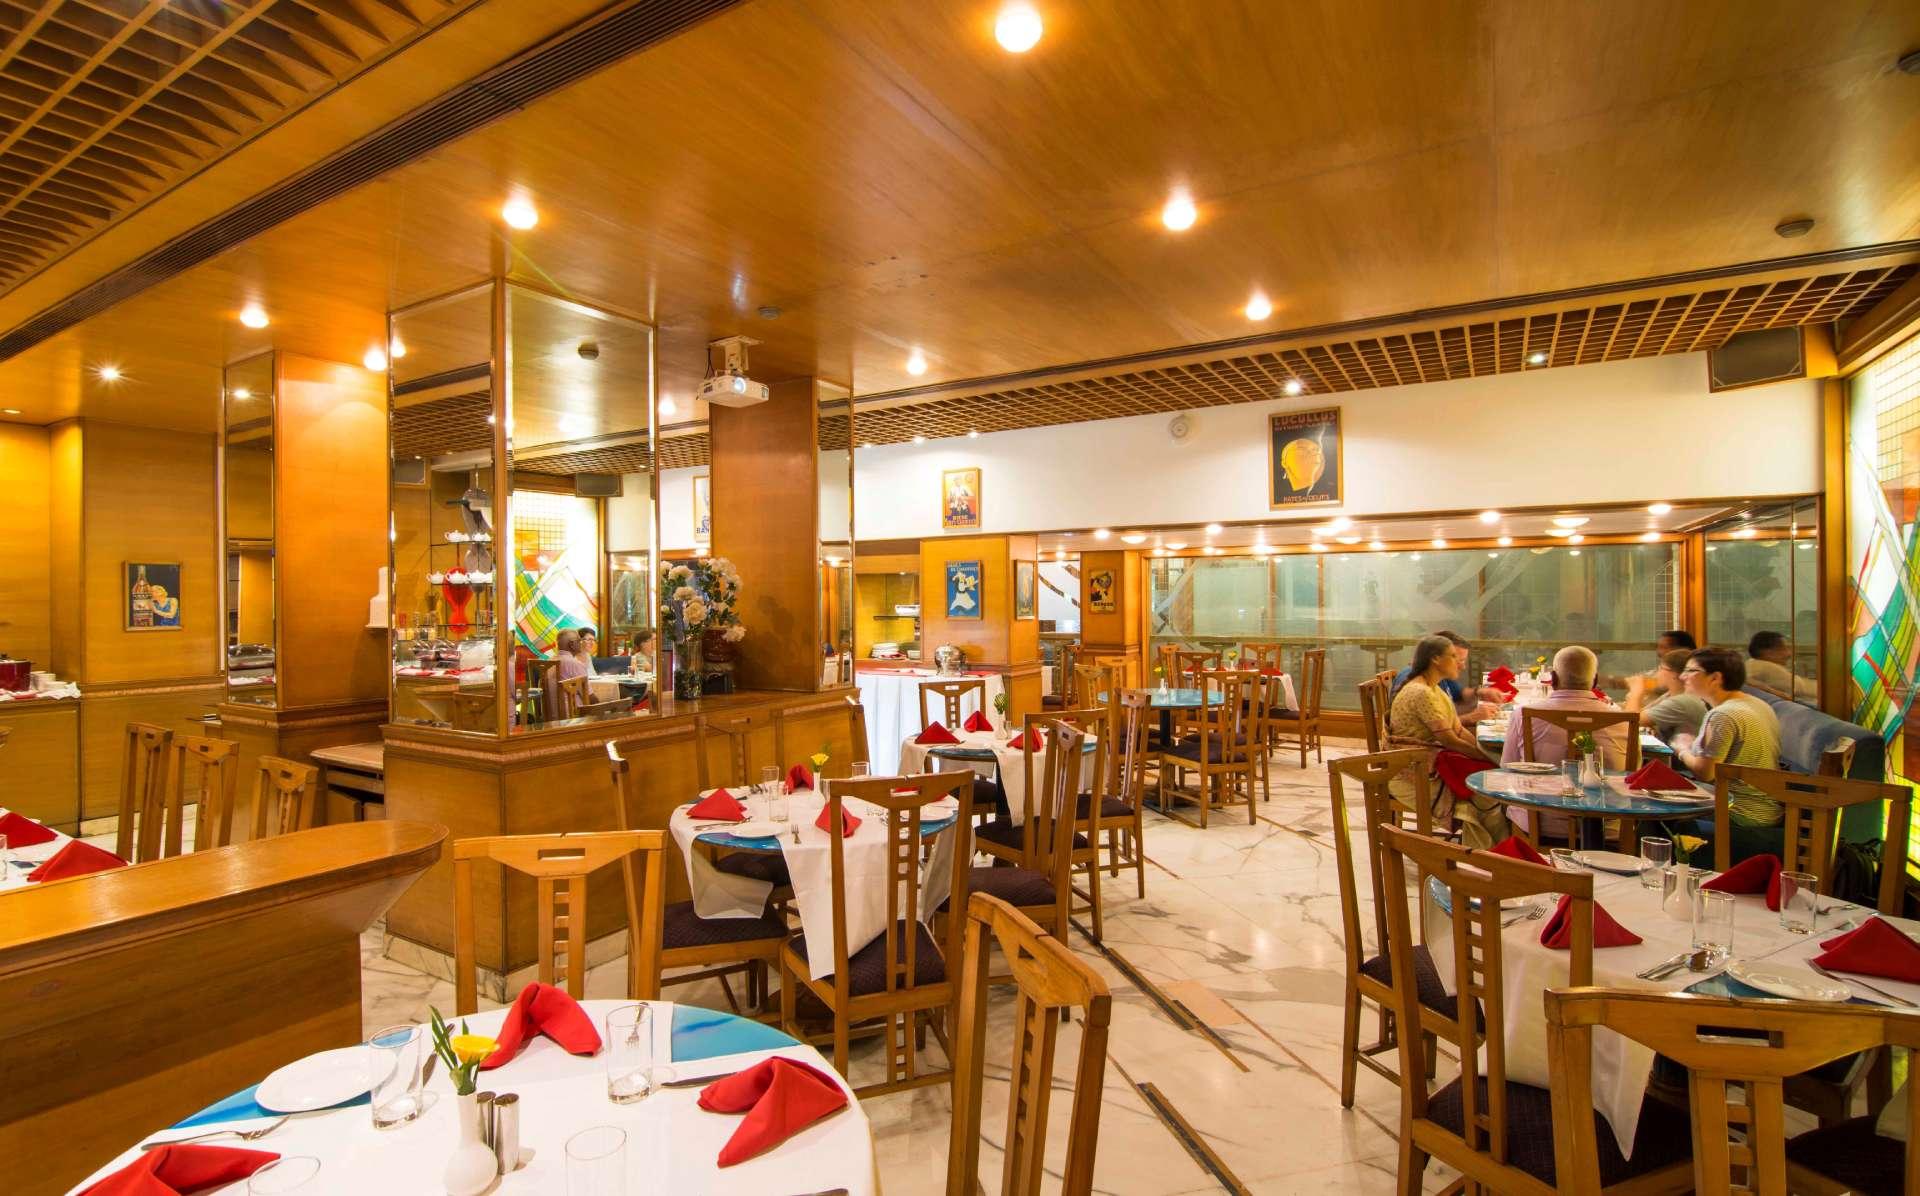 flavours restaurant the ambassador mumbai 1 - The Ambassador | Heritage Hotels in Mumbai, Aurangabad, Chennai - Flavors Cafe